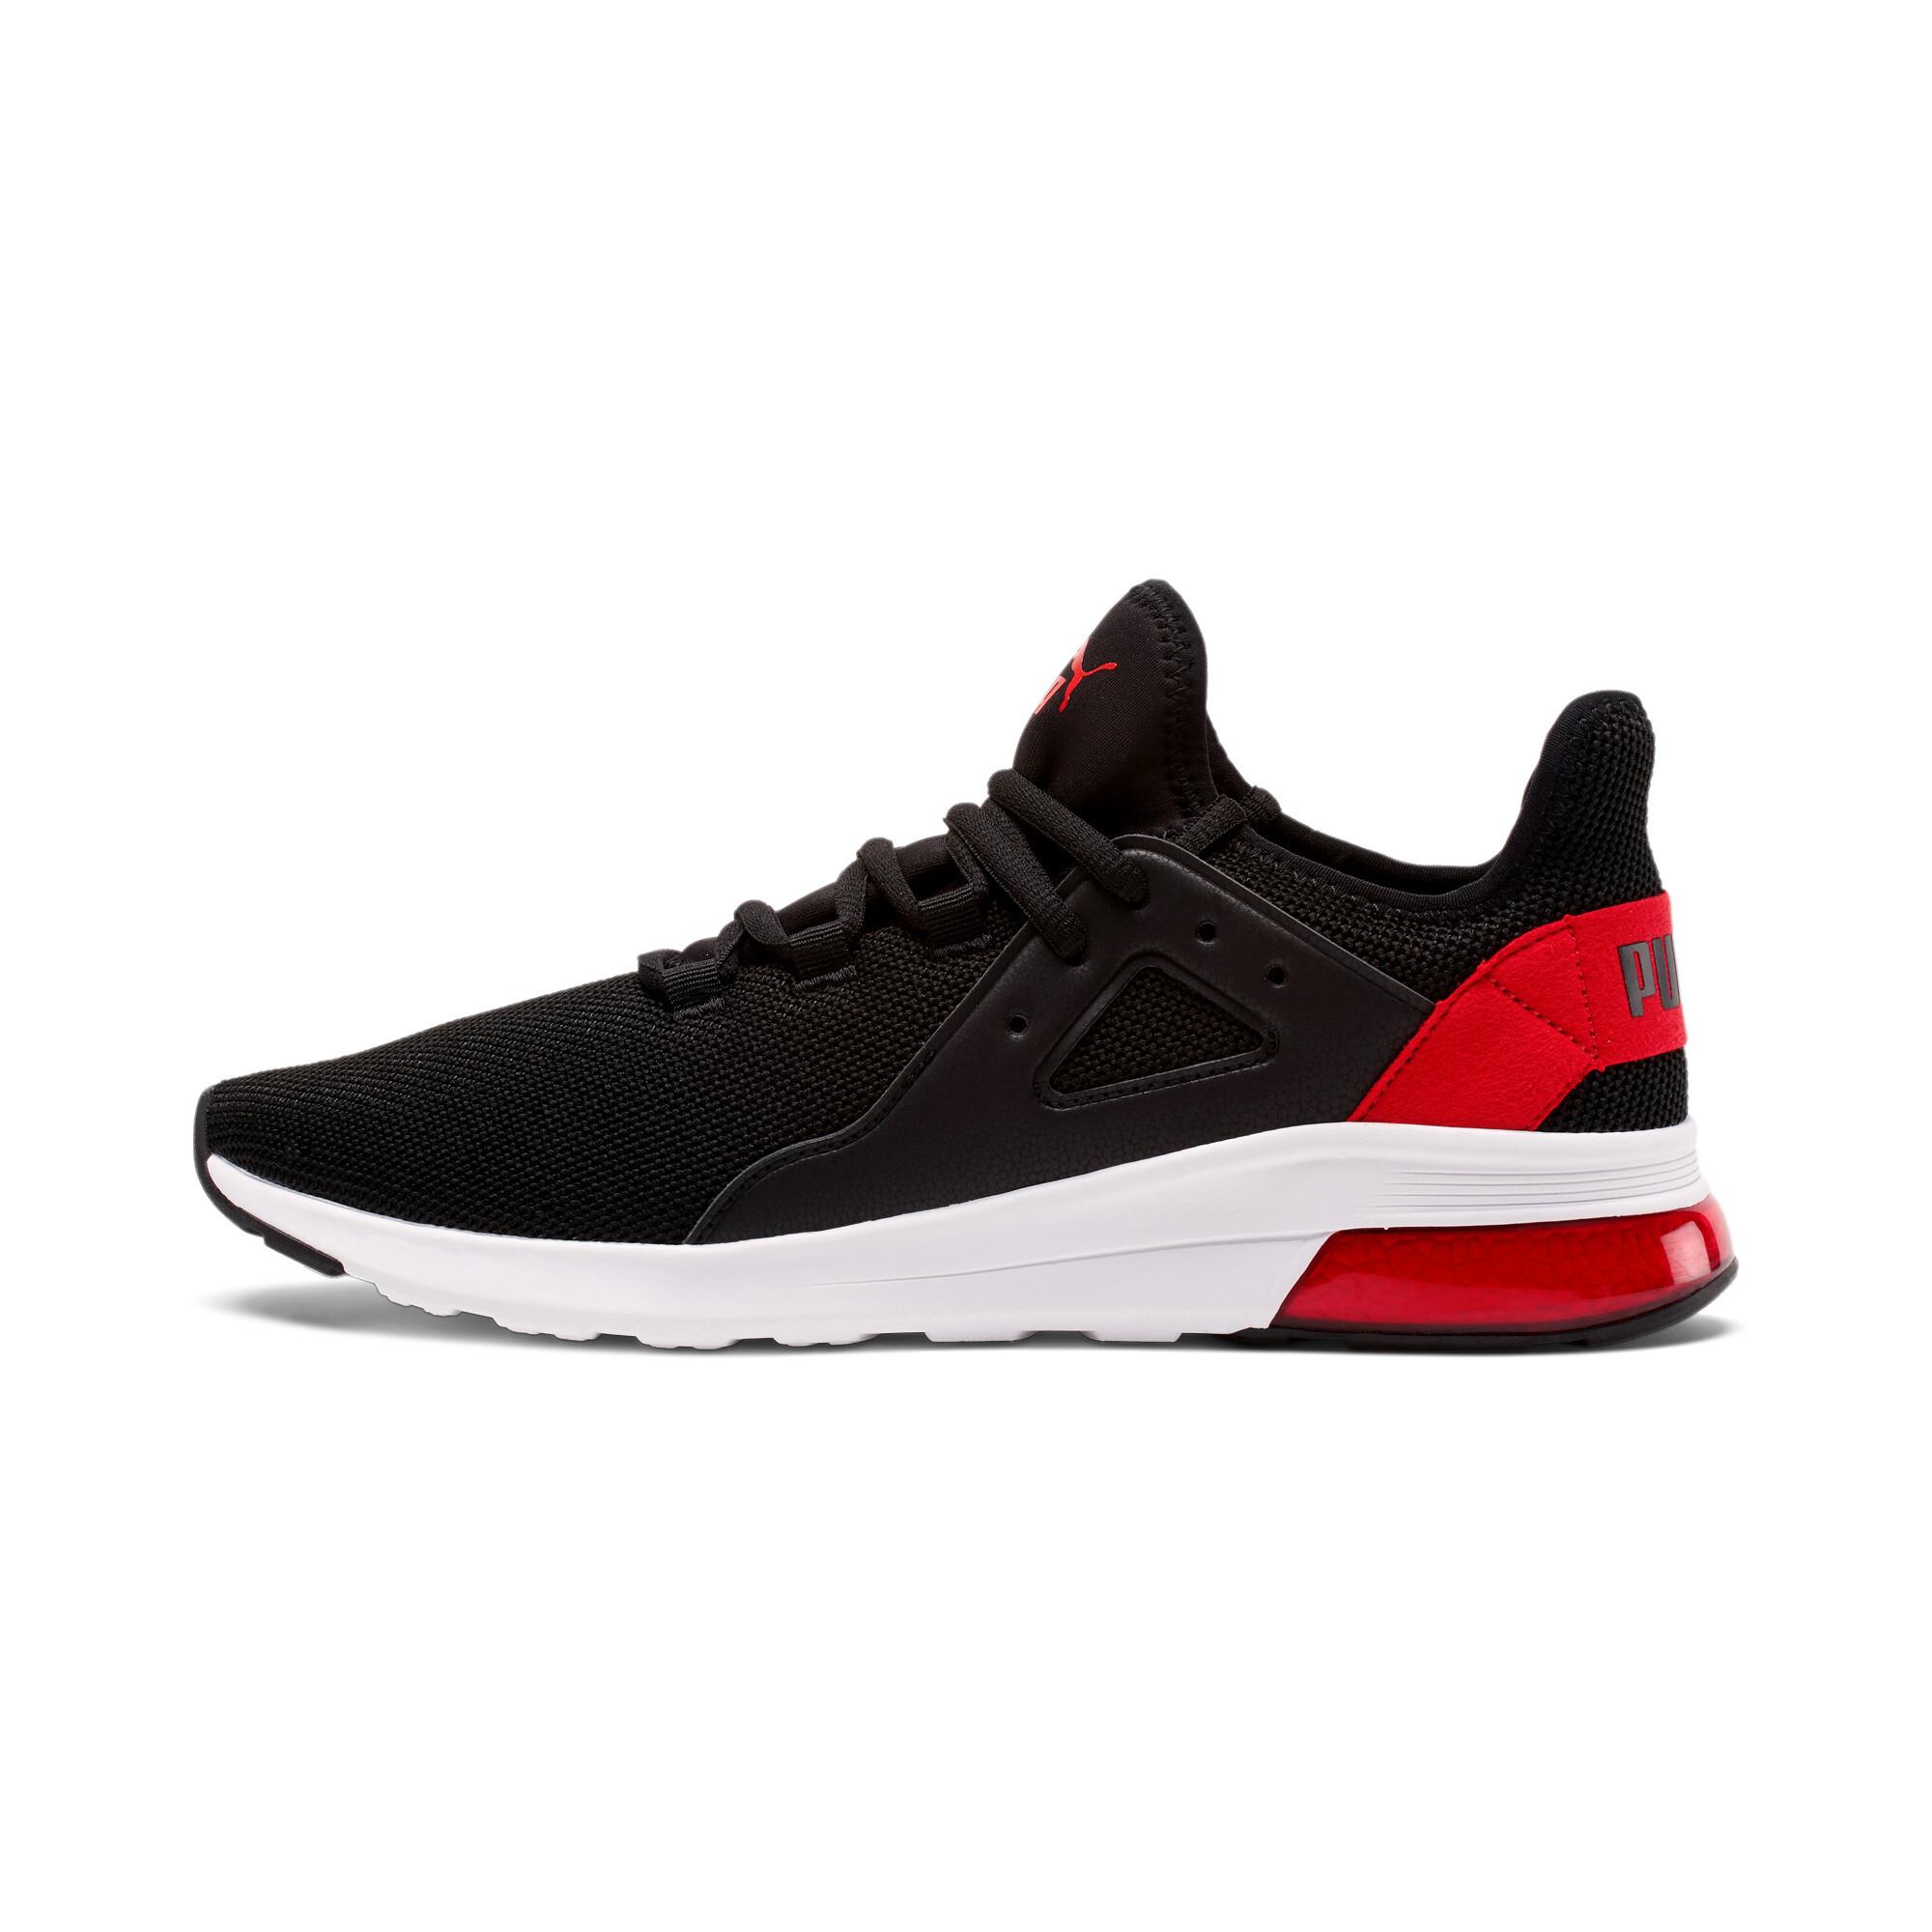 PUMA-Men-039-s-Electron-Street-Sneakers thumbnail 27